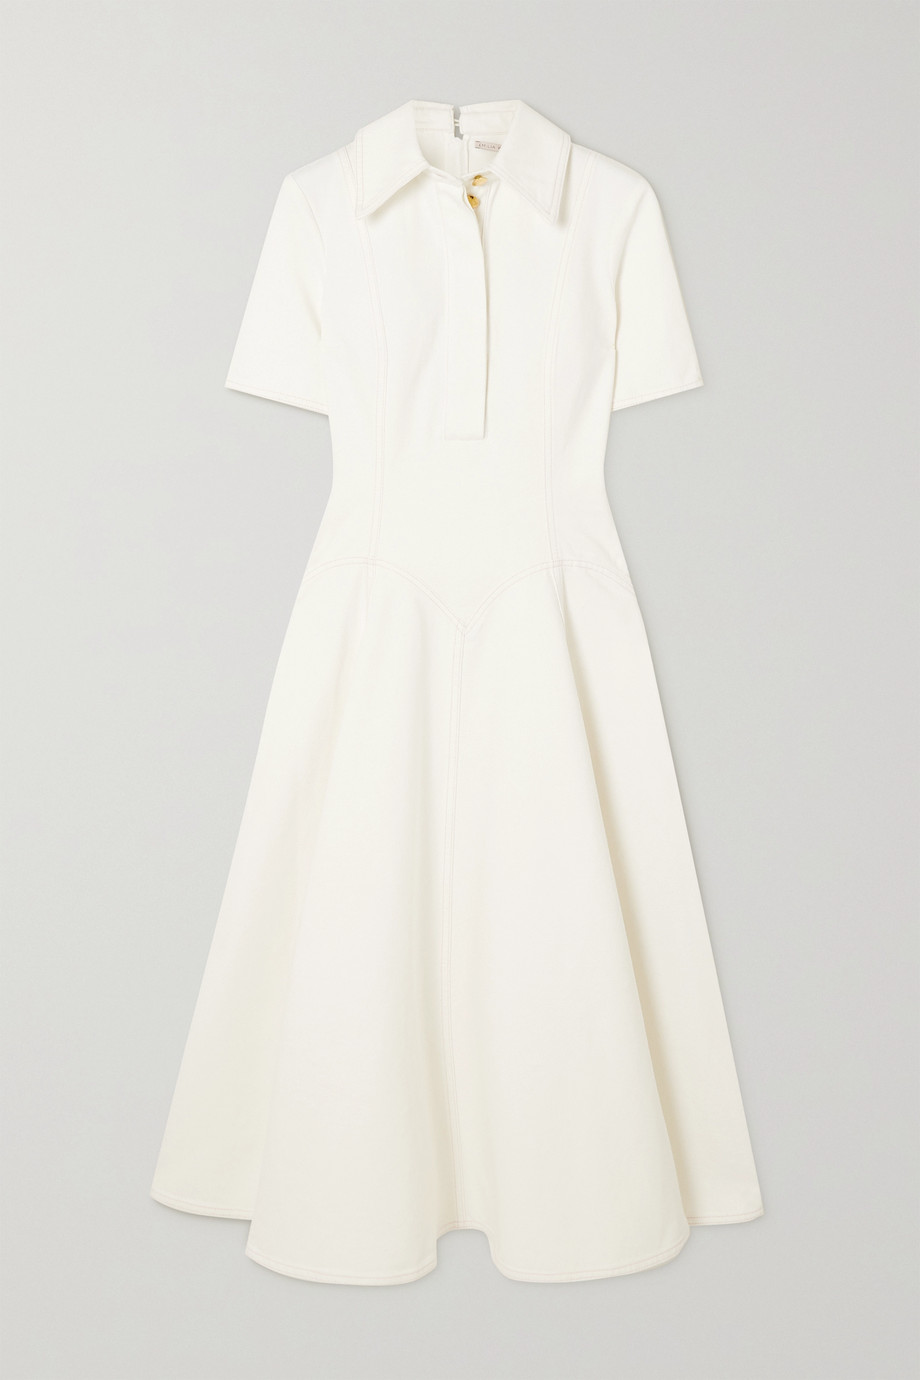 Emilia Wickstead Jody Hemdblusenkleid aus Denim